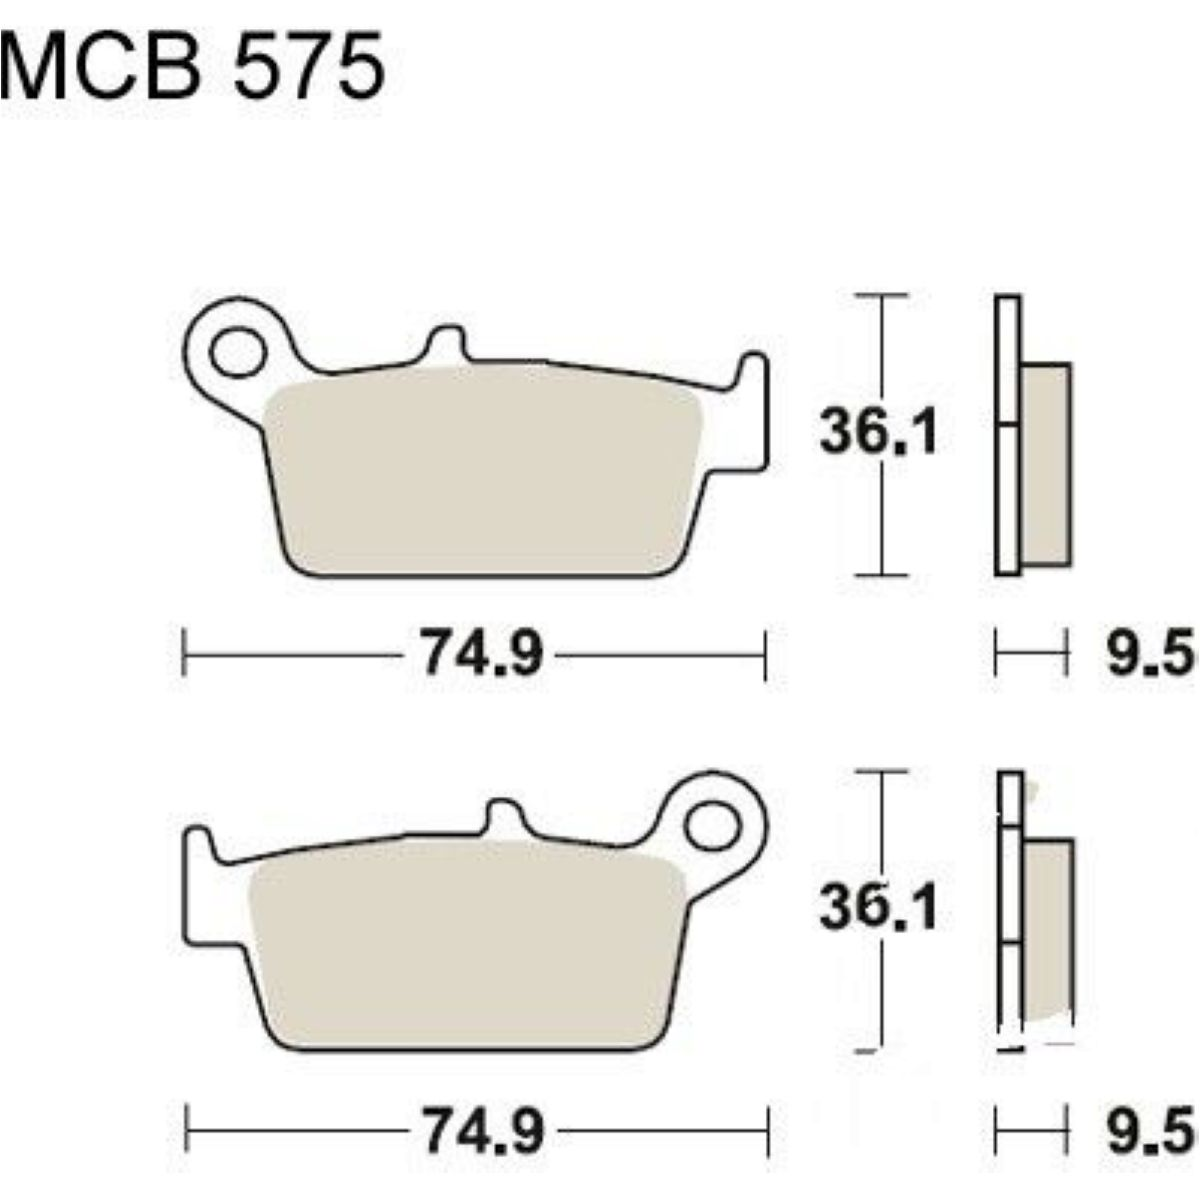 01//06 Federbalg Luftfederung HA Für Mercedes R-Klasse W251 V251 Bj